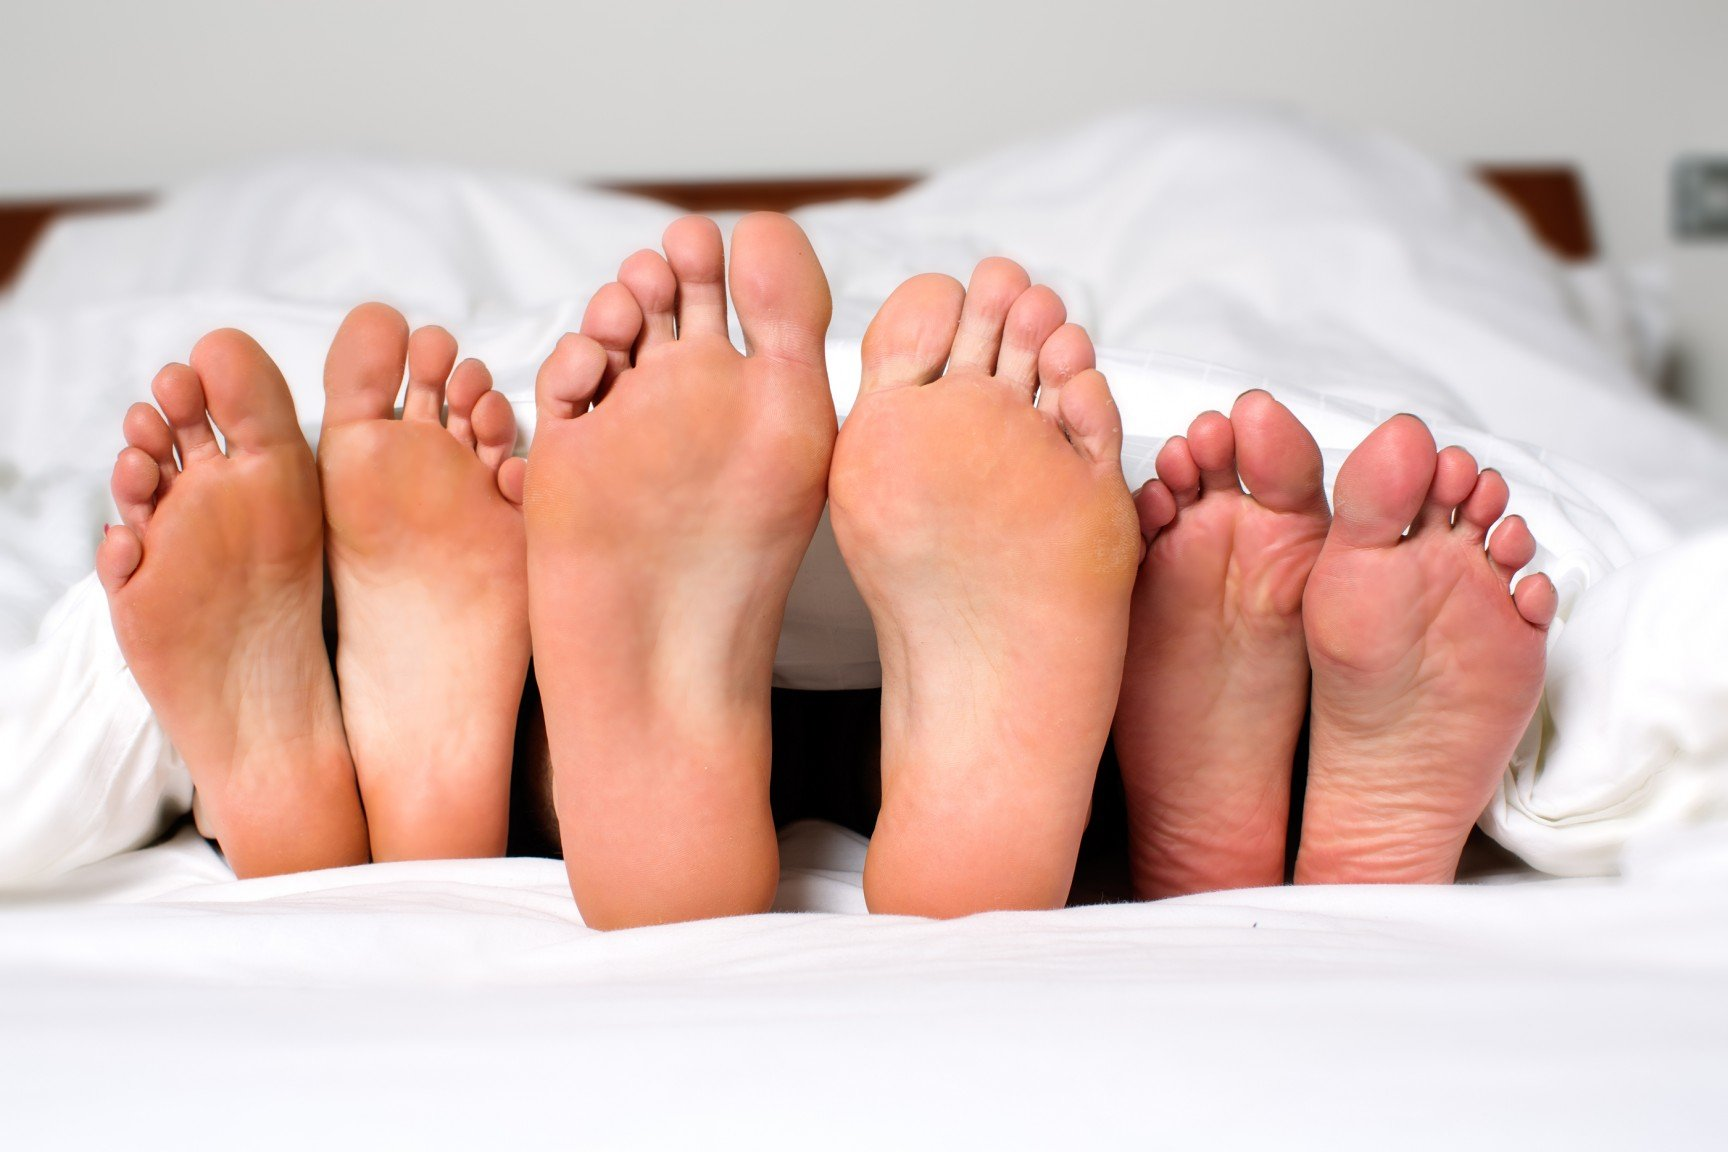 Шведская секс семья фото 21 фотография